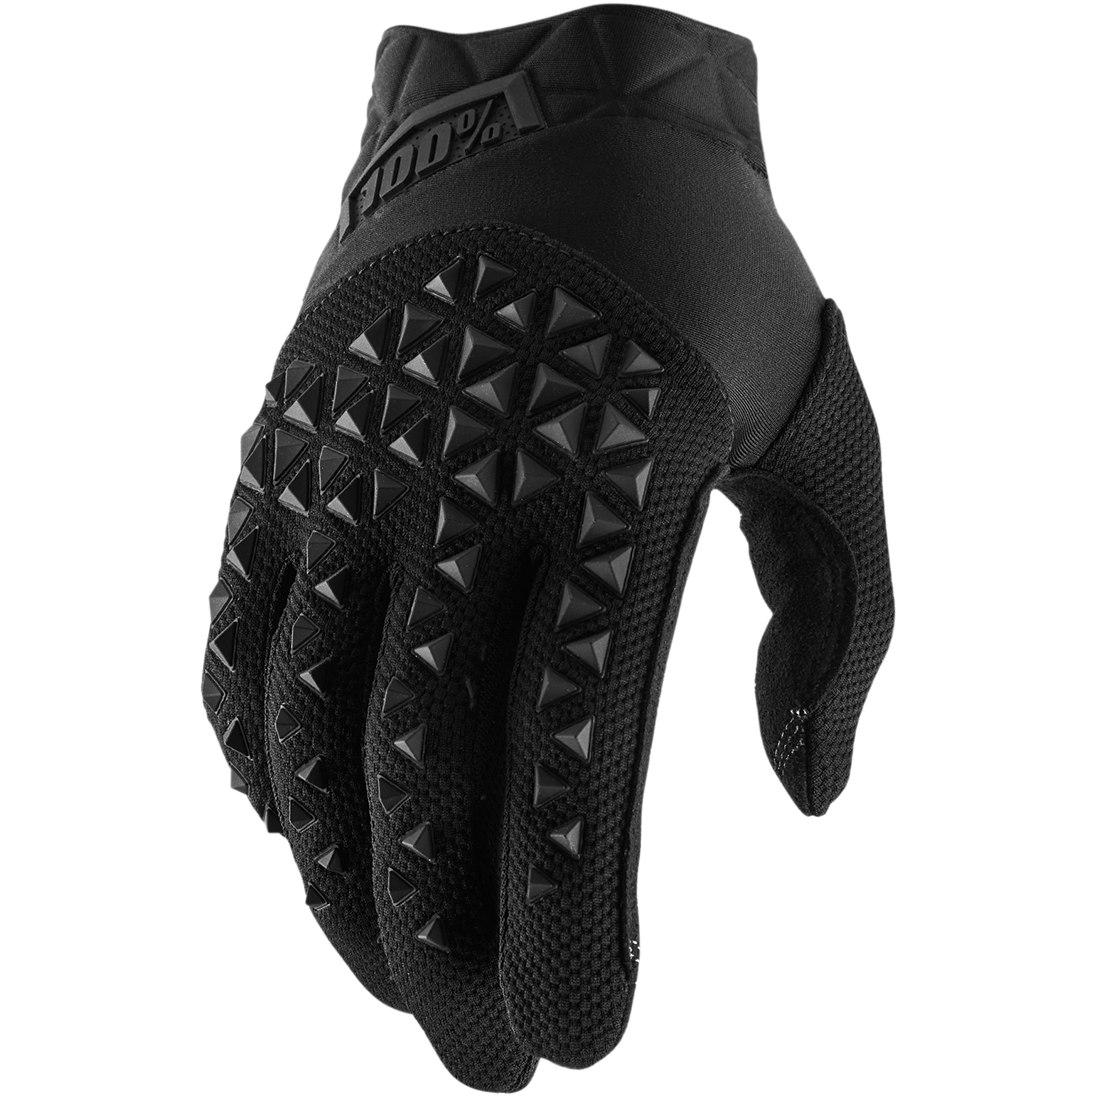 100% Airmatic Guantes - black/charcoal